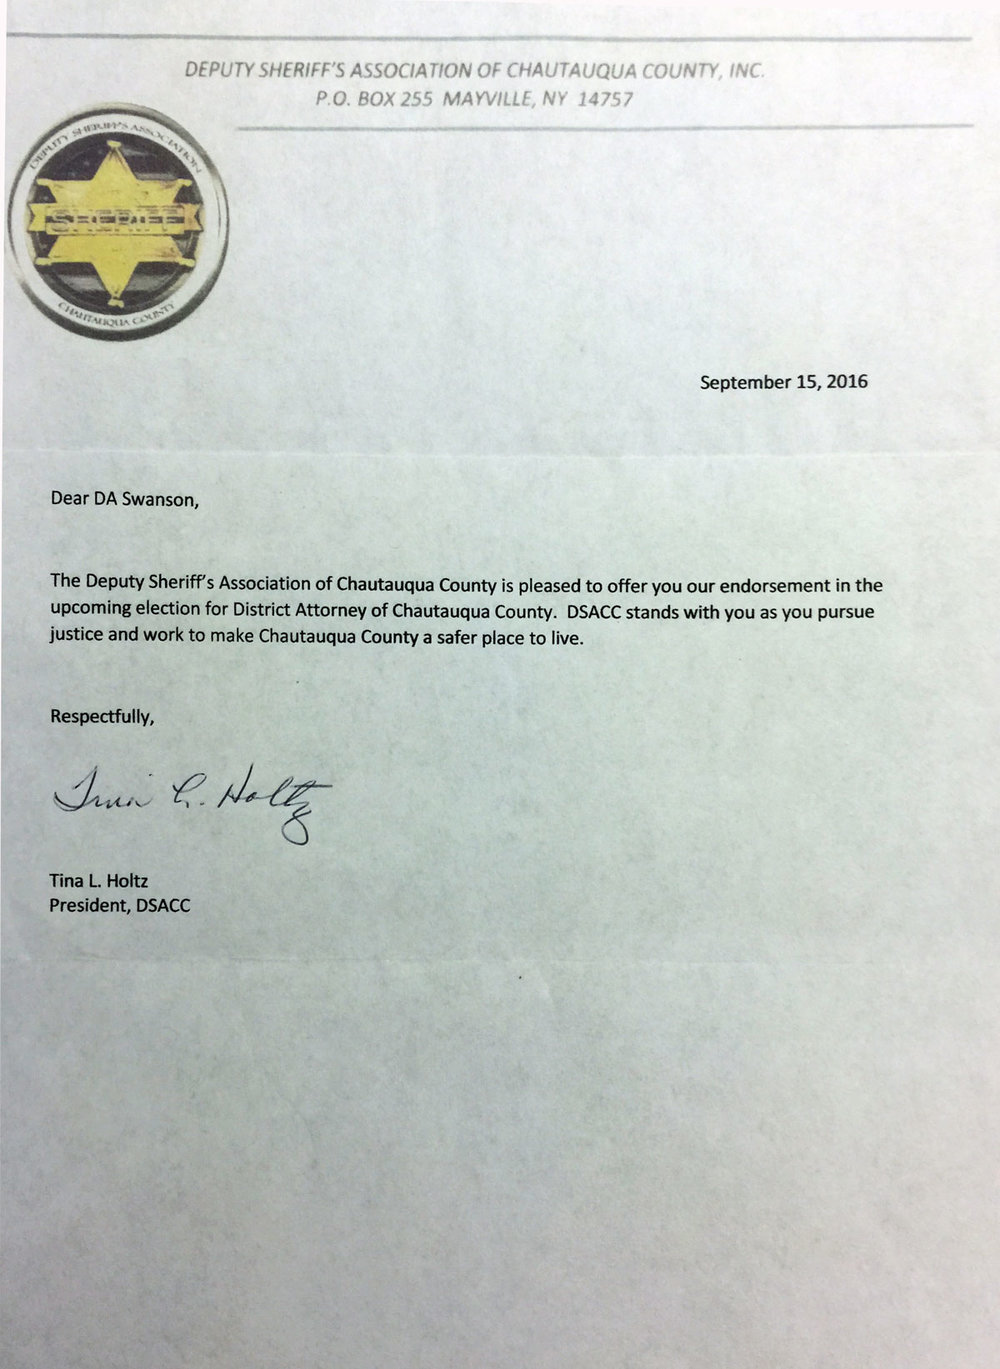 Deputy Sheriff's Association of Chautauqua County